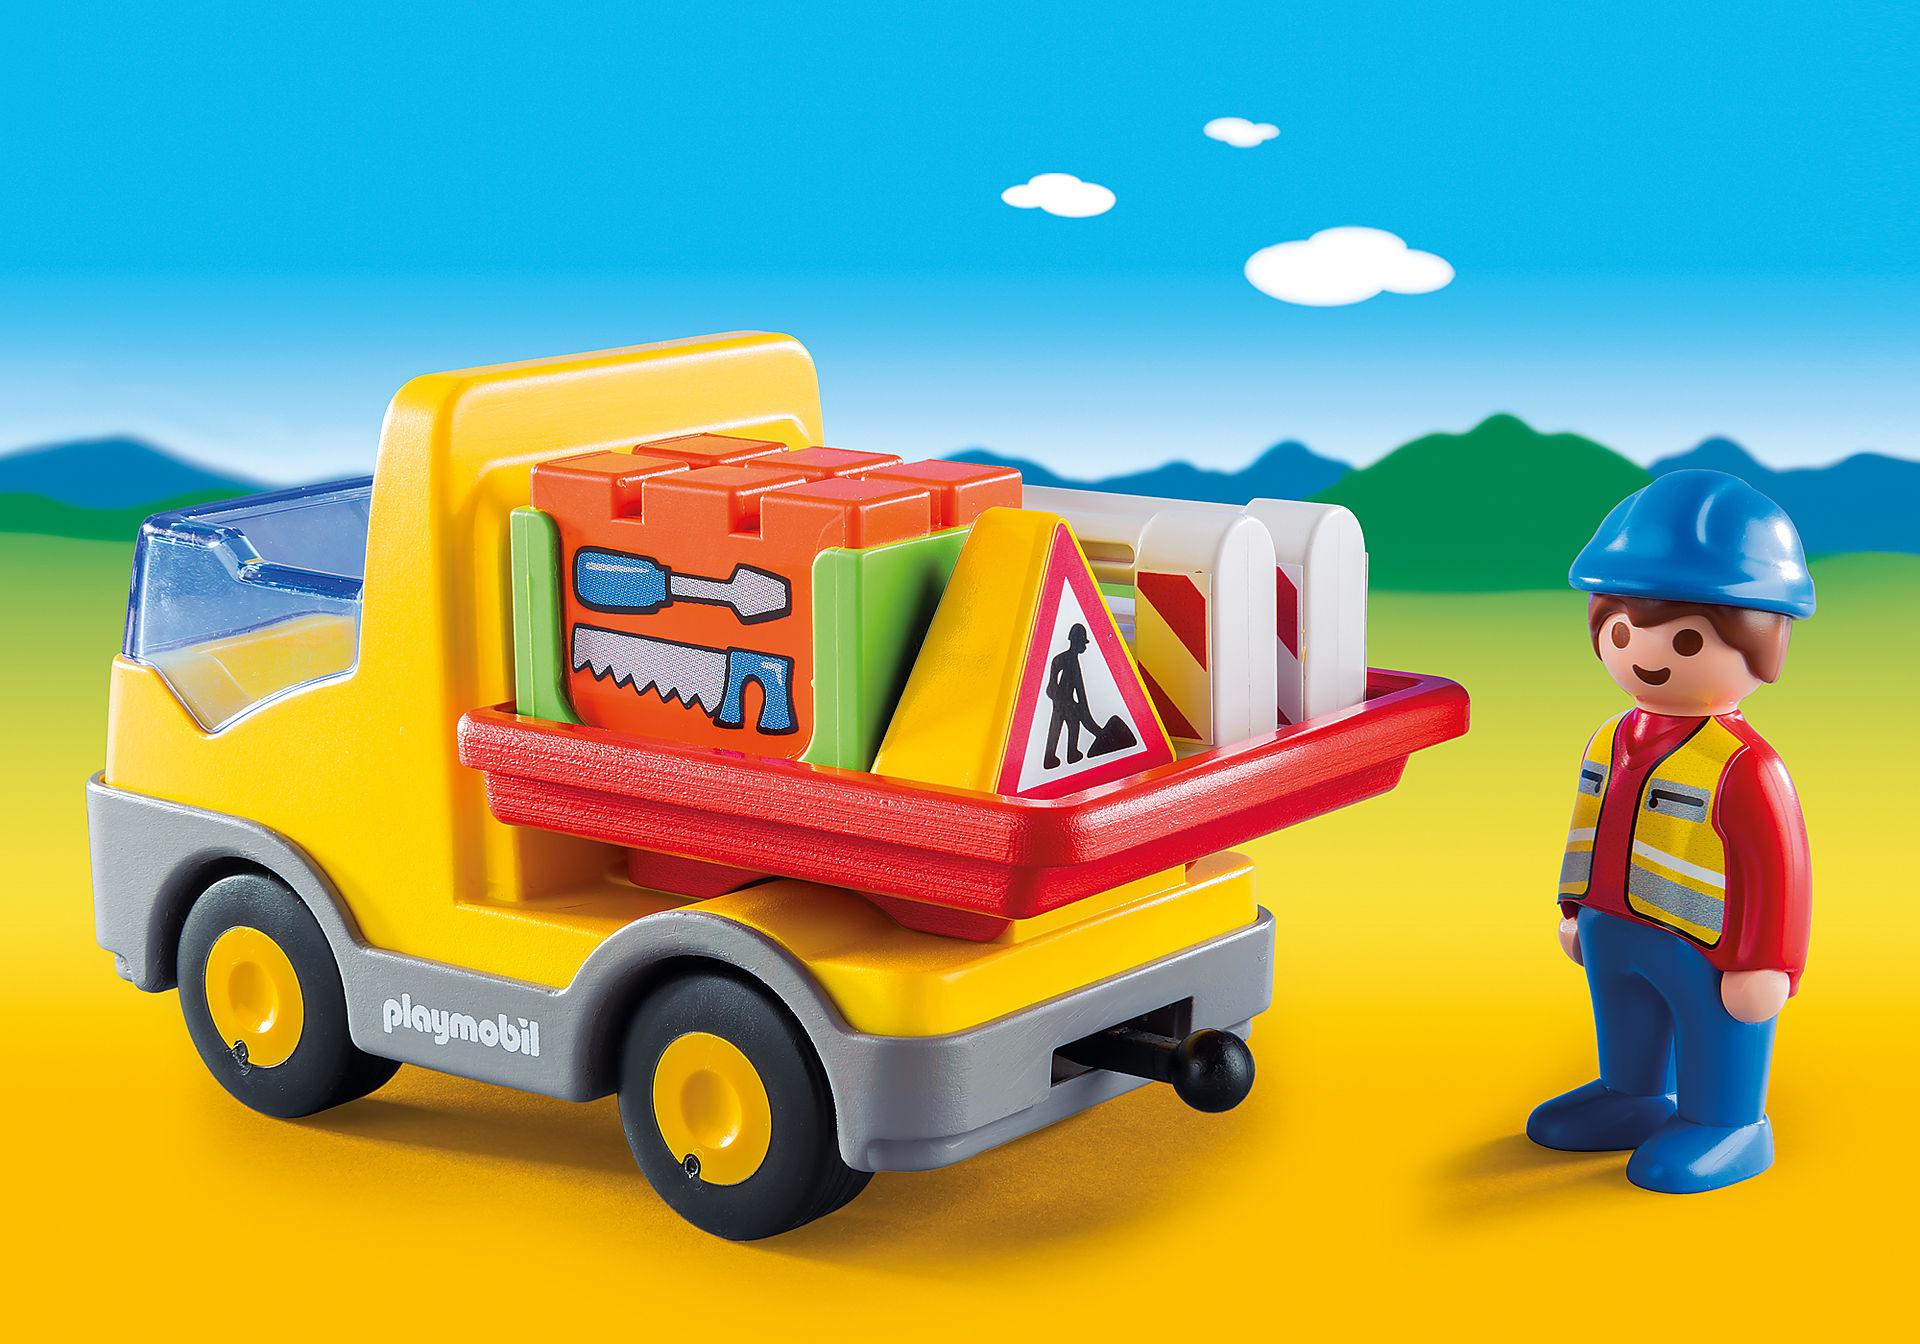 http://media.playmobil.com/i/playmobil/6960_product_extra1/Muldenkipper